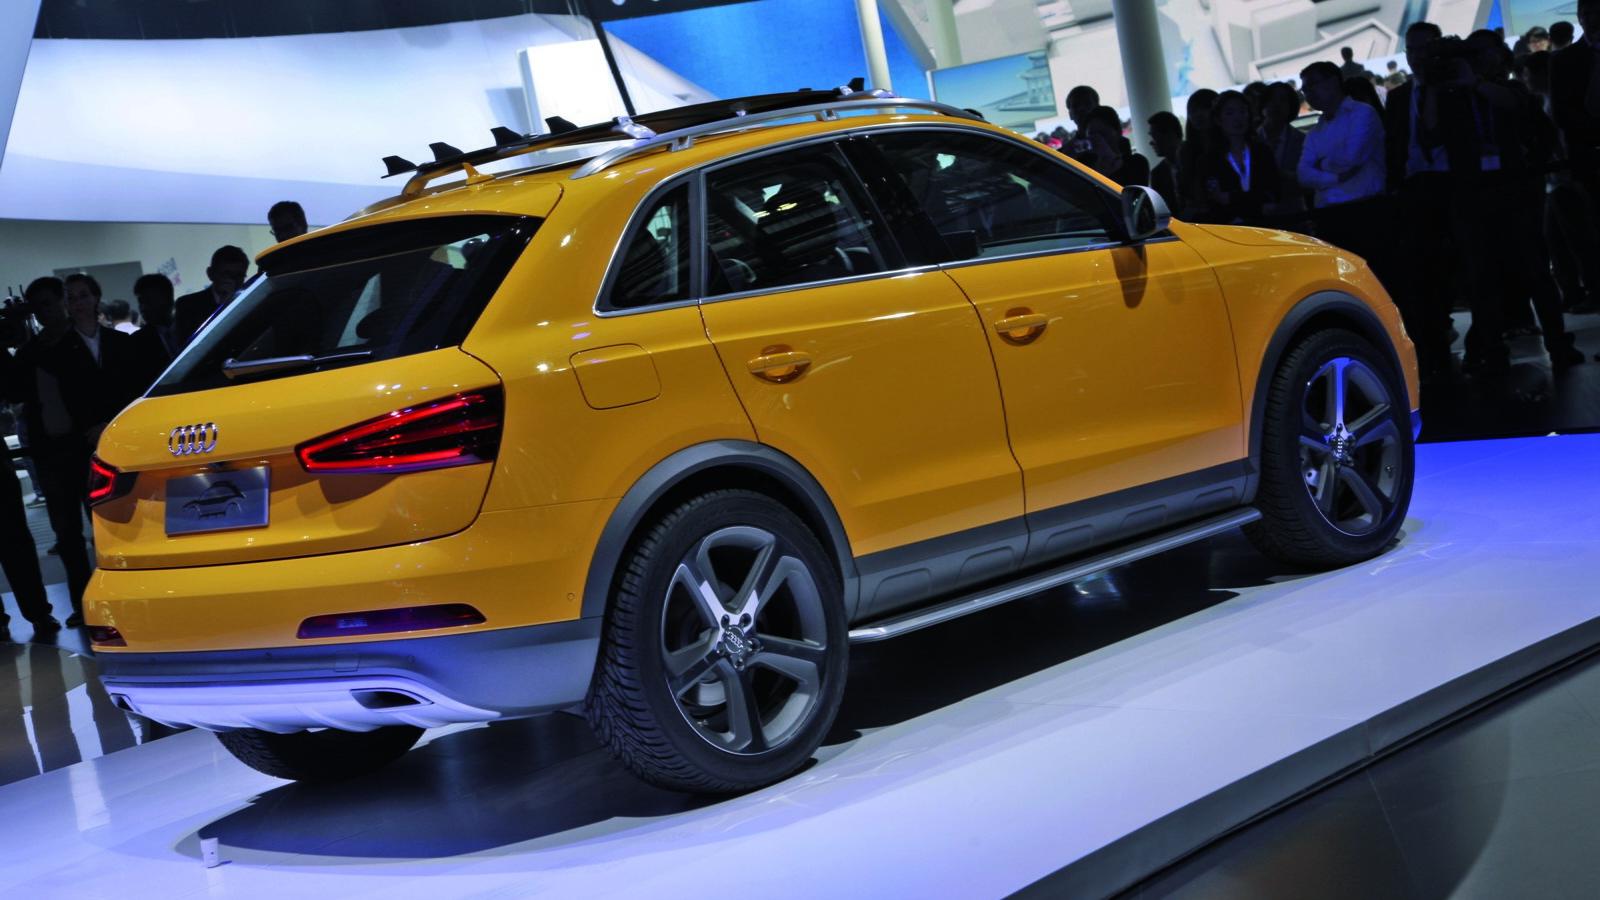 Audi's Q3 Jinlong Yufeng concept for the 2012 Beijing Auto Show